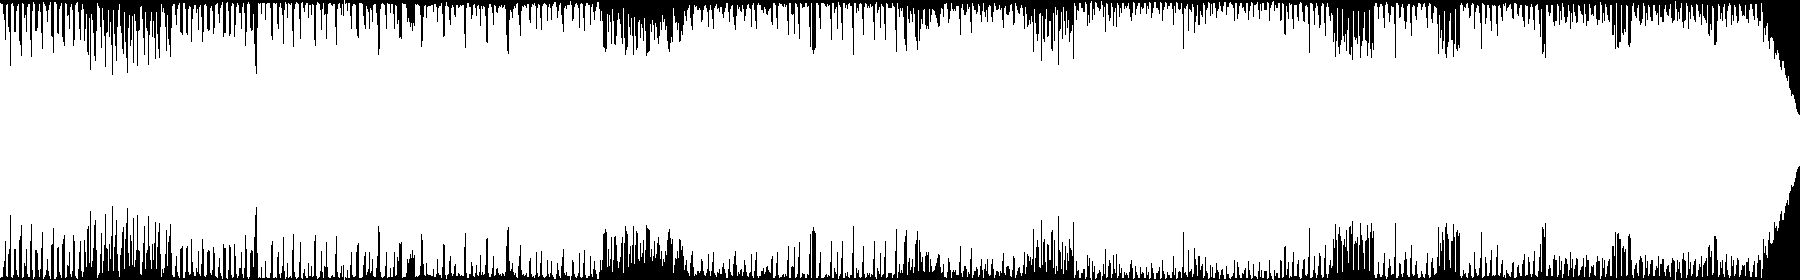 REBEL TRAXX audio waveform